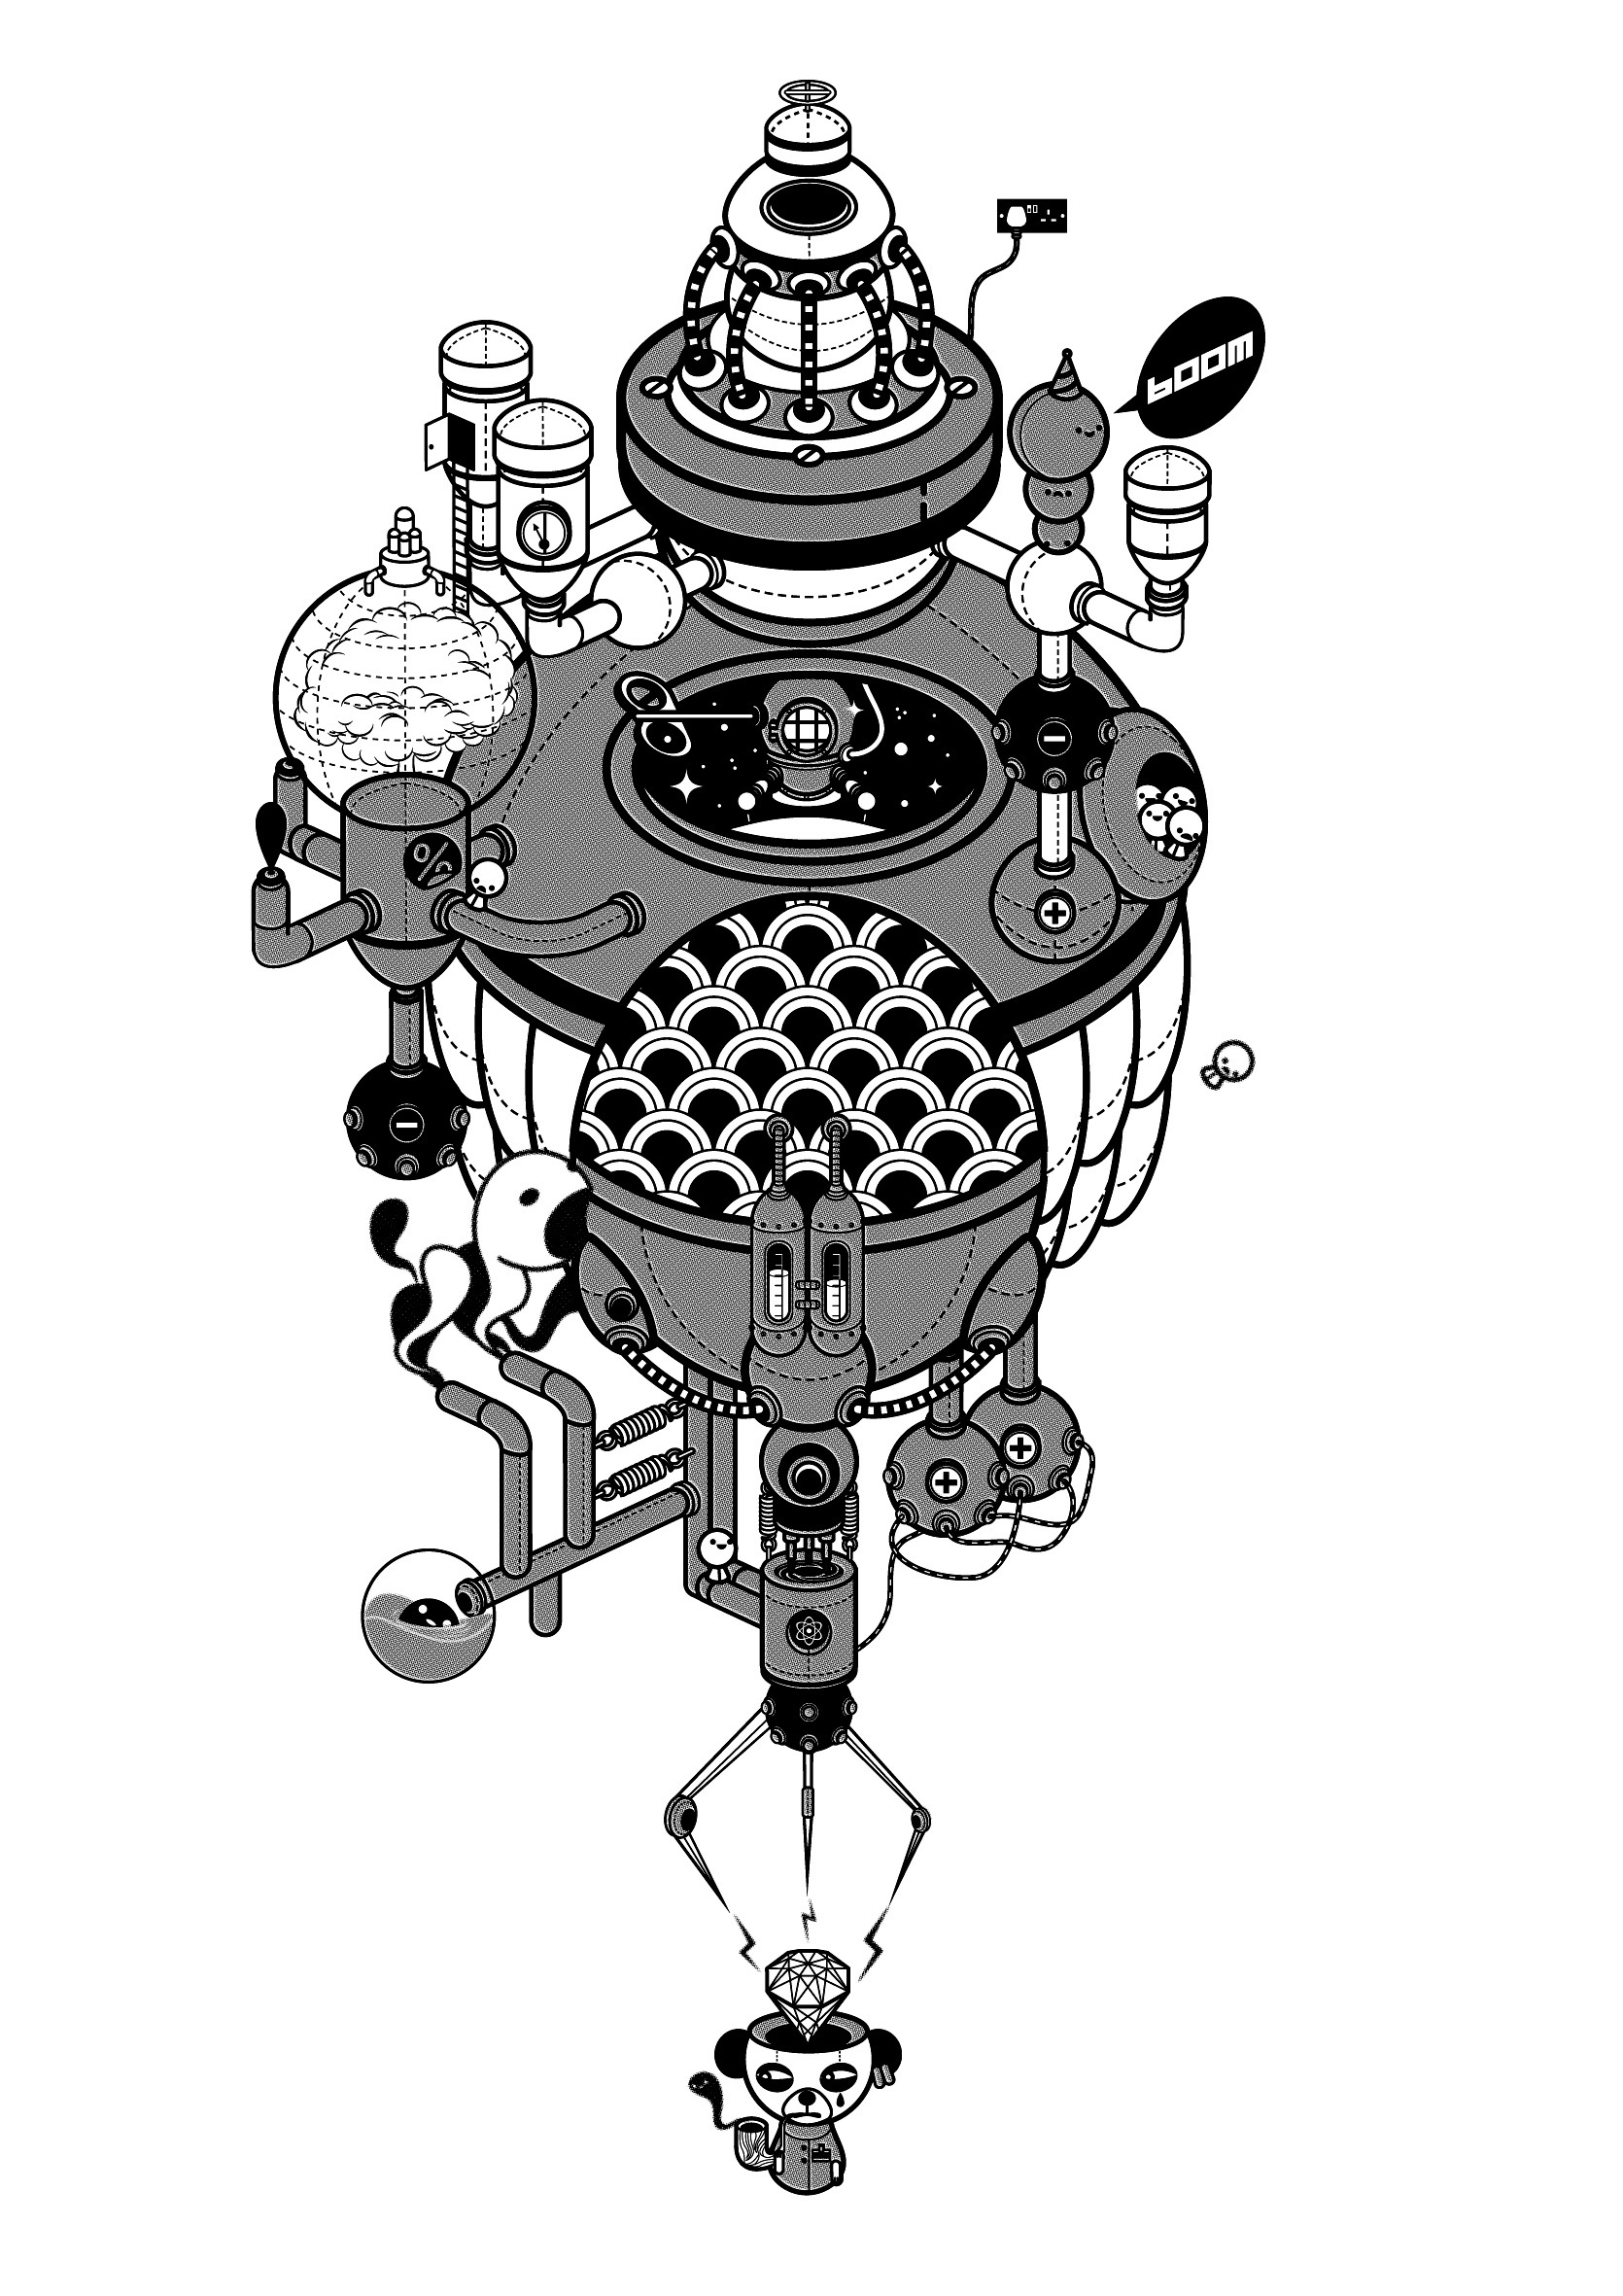 Character Design London : Stephen chan liverpool illustrator isometric